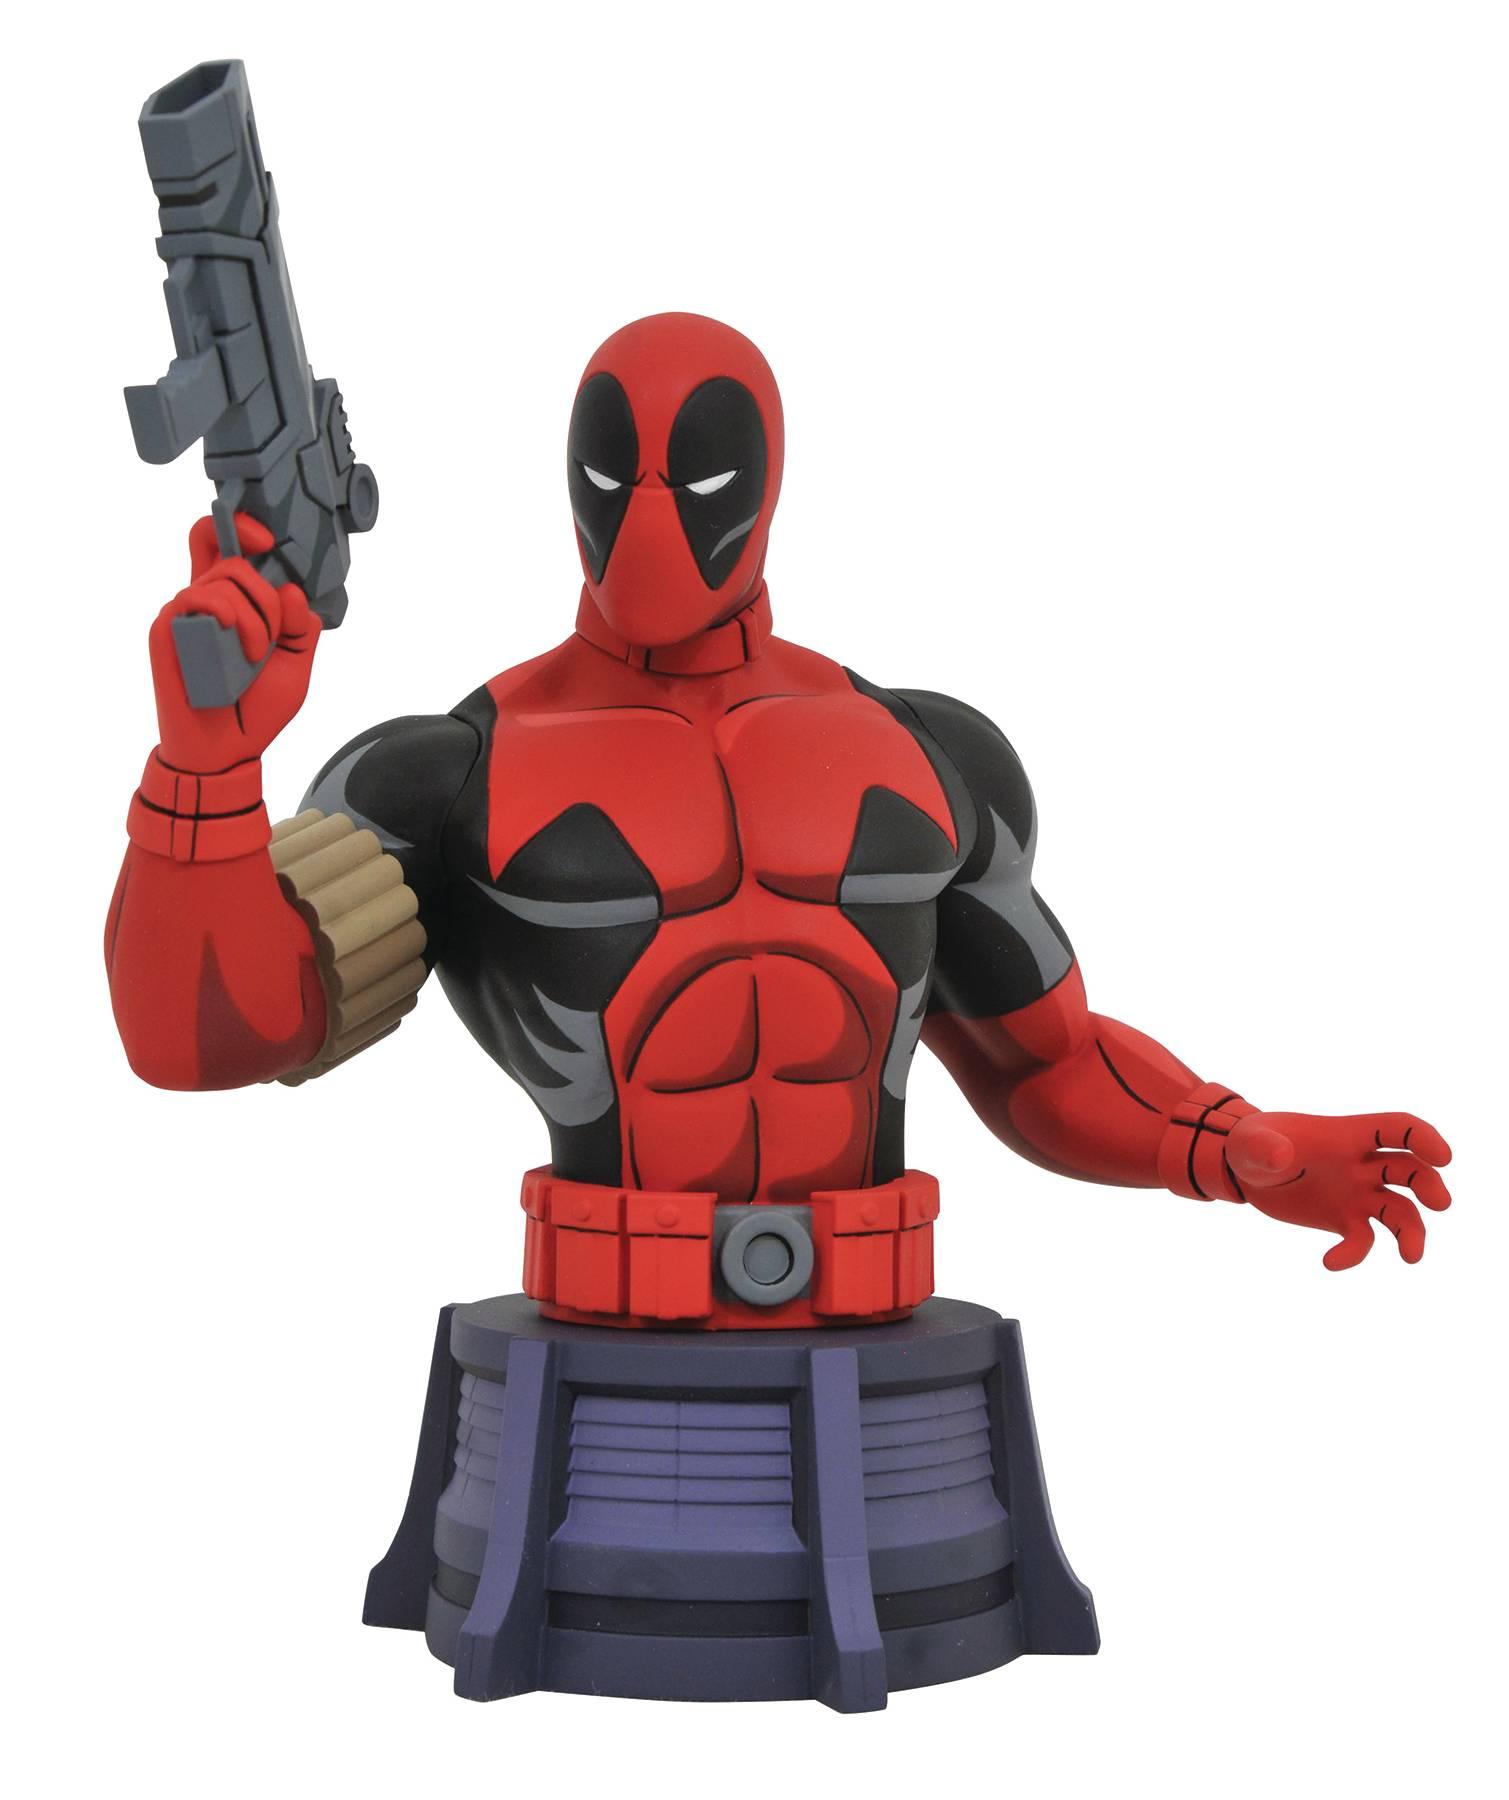 Animated X-Men: Deadpool Bust PVC Figure